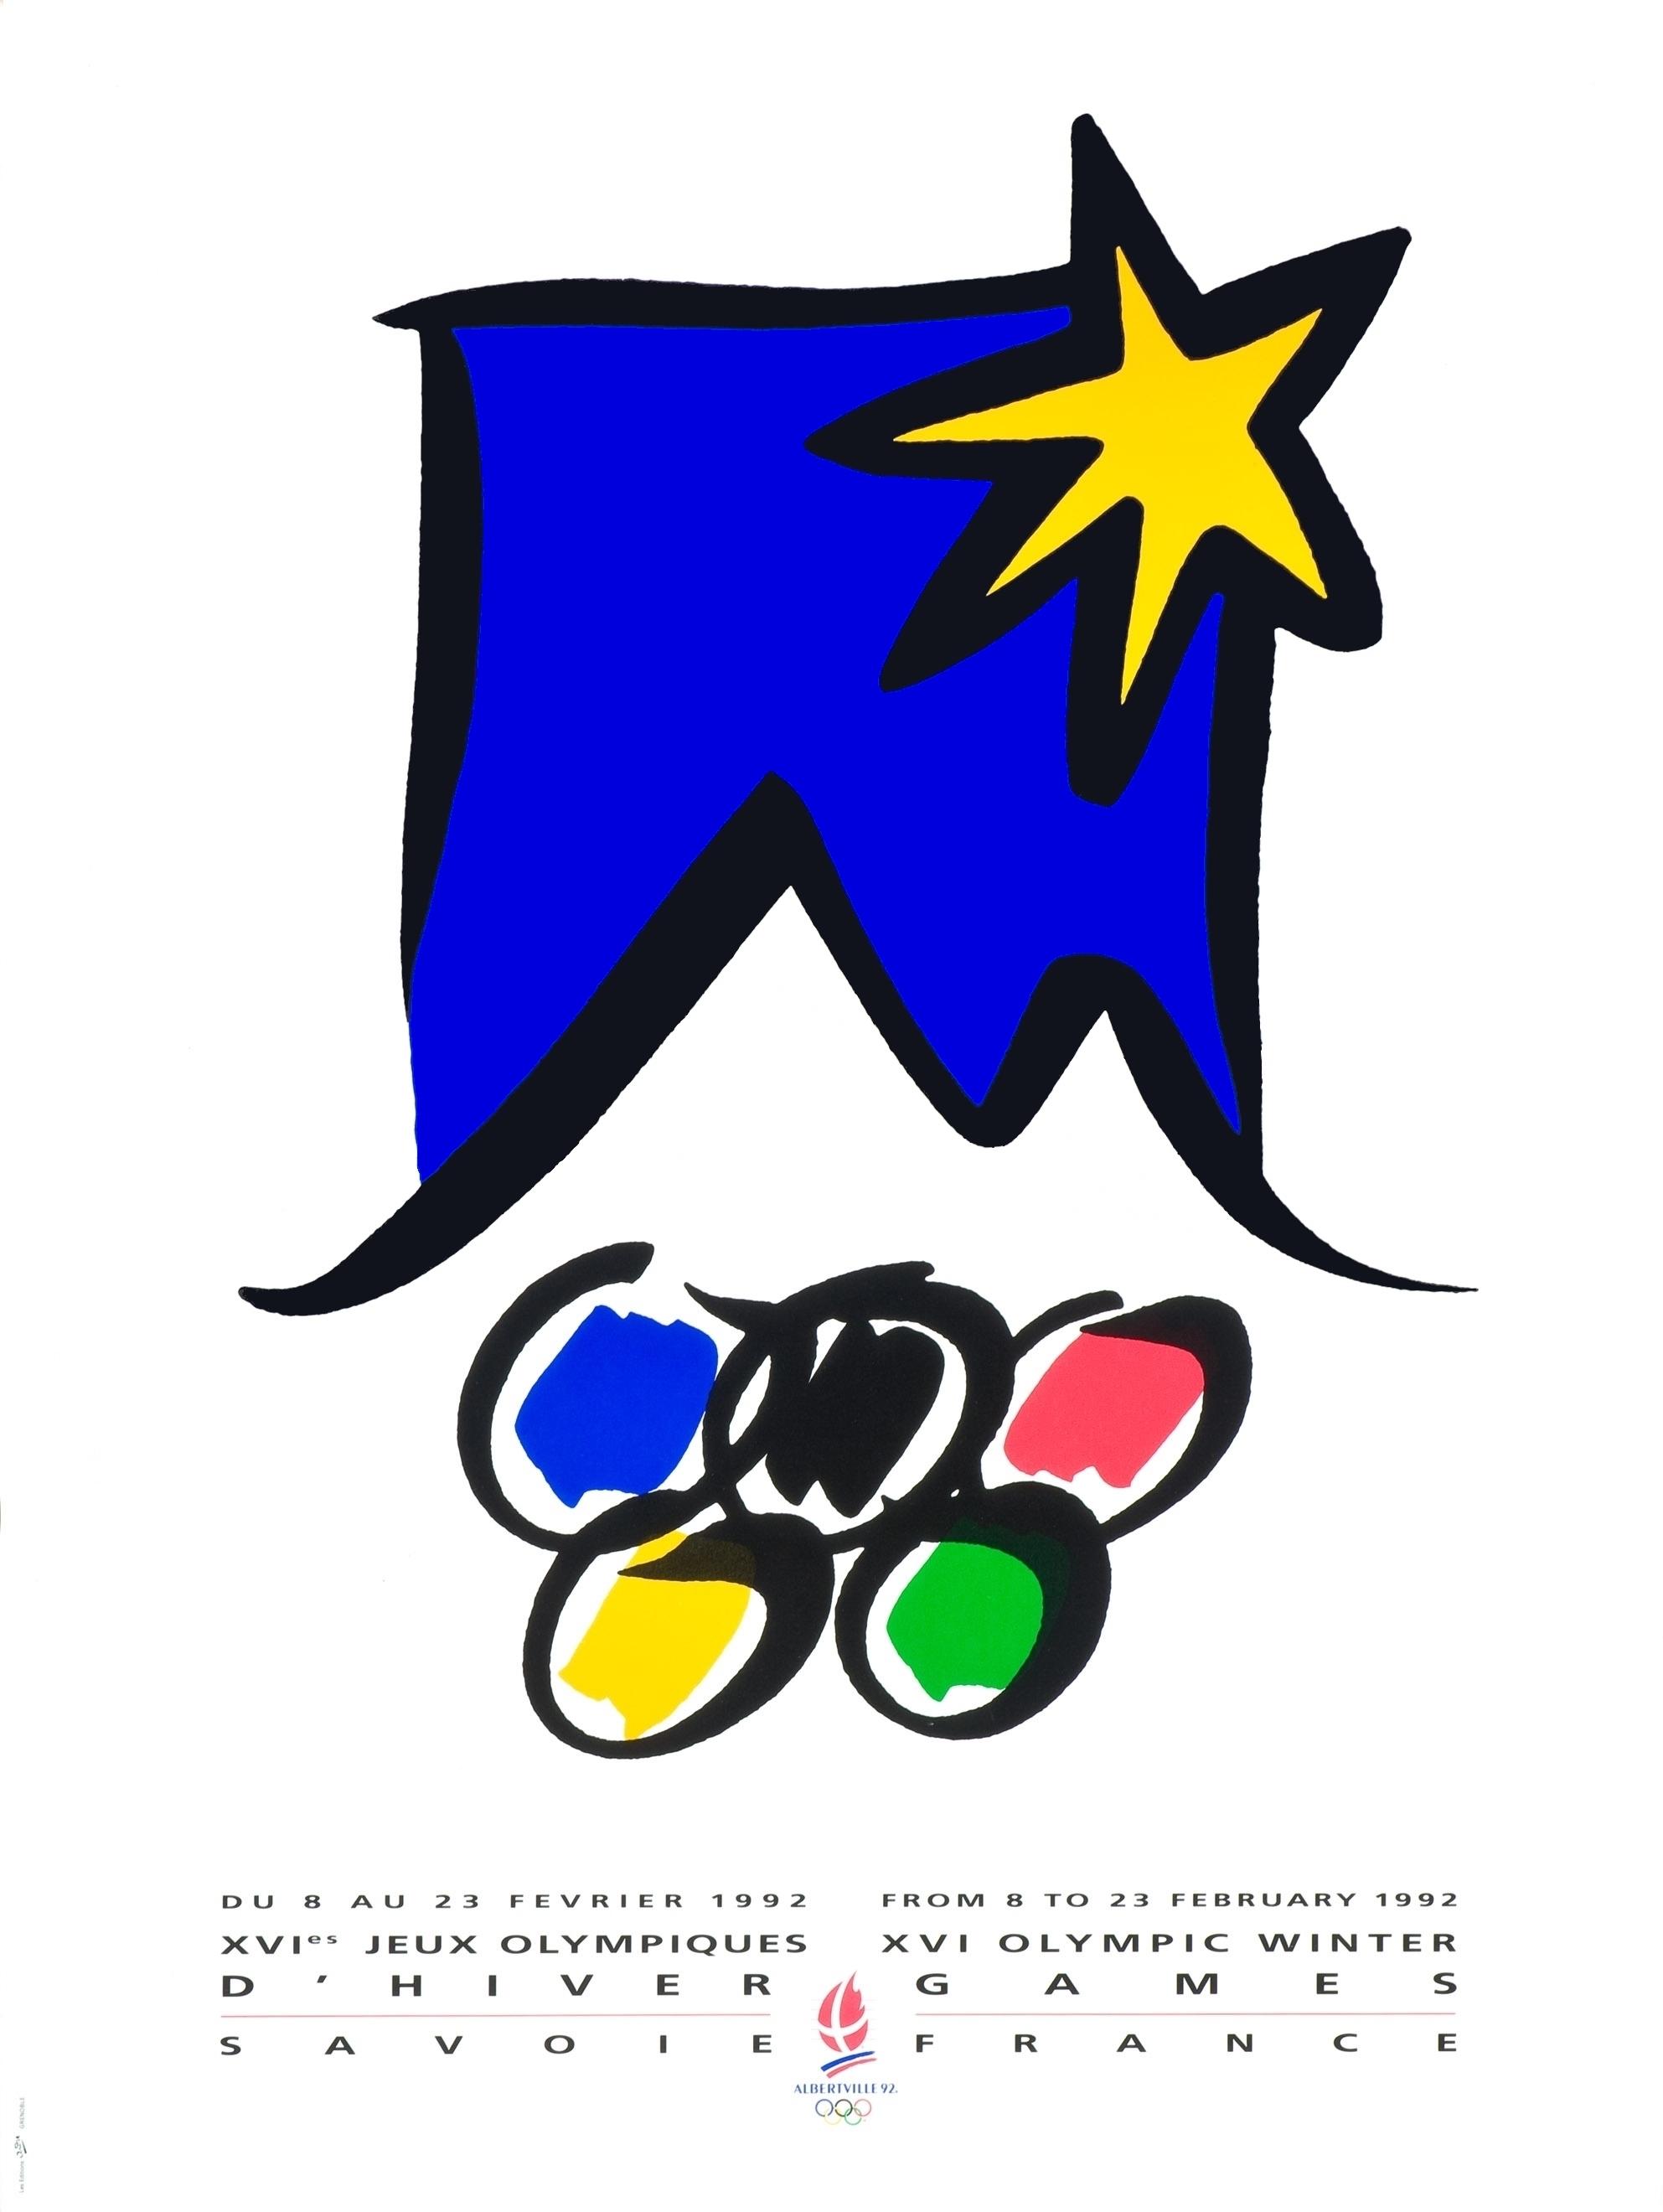 1992 Winter Olympics - Albertville, France